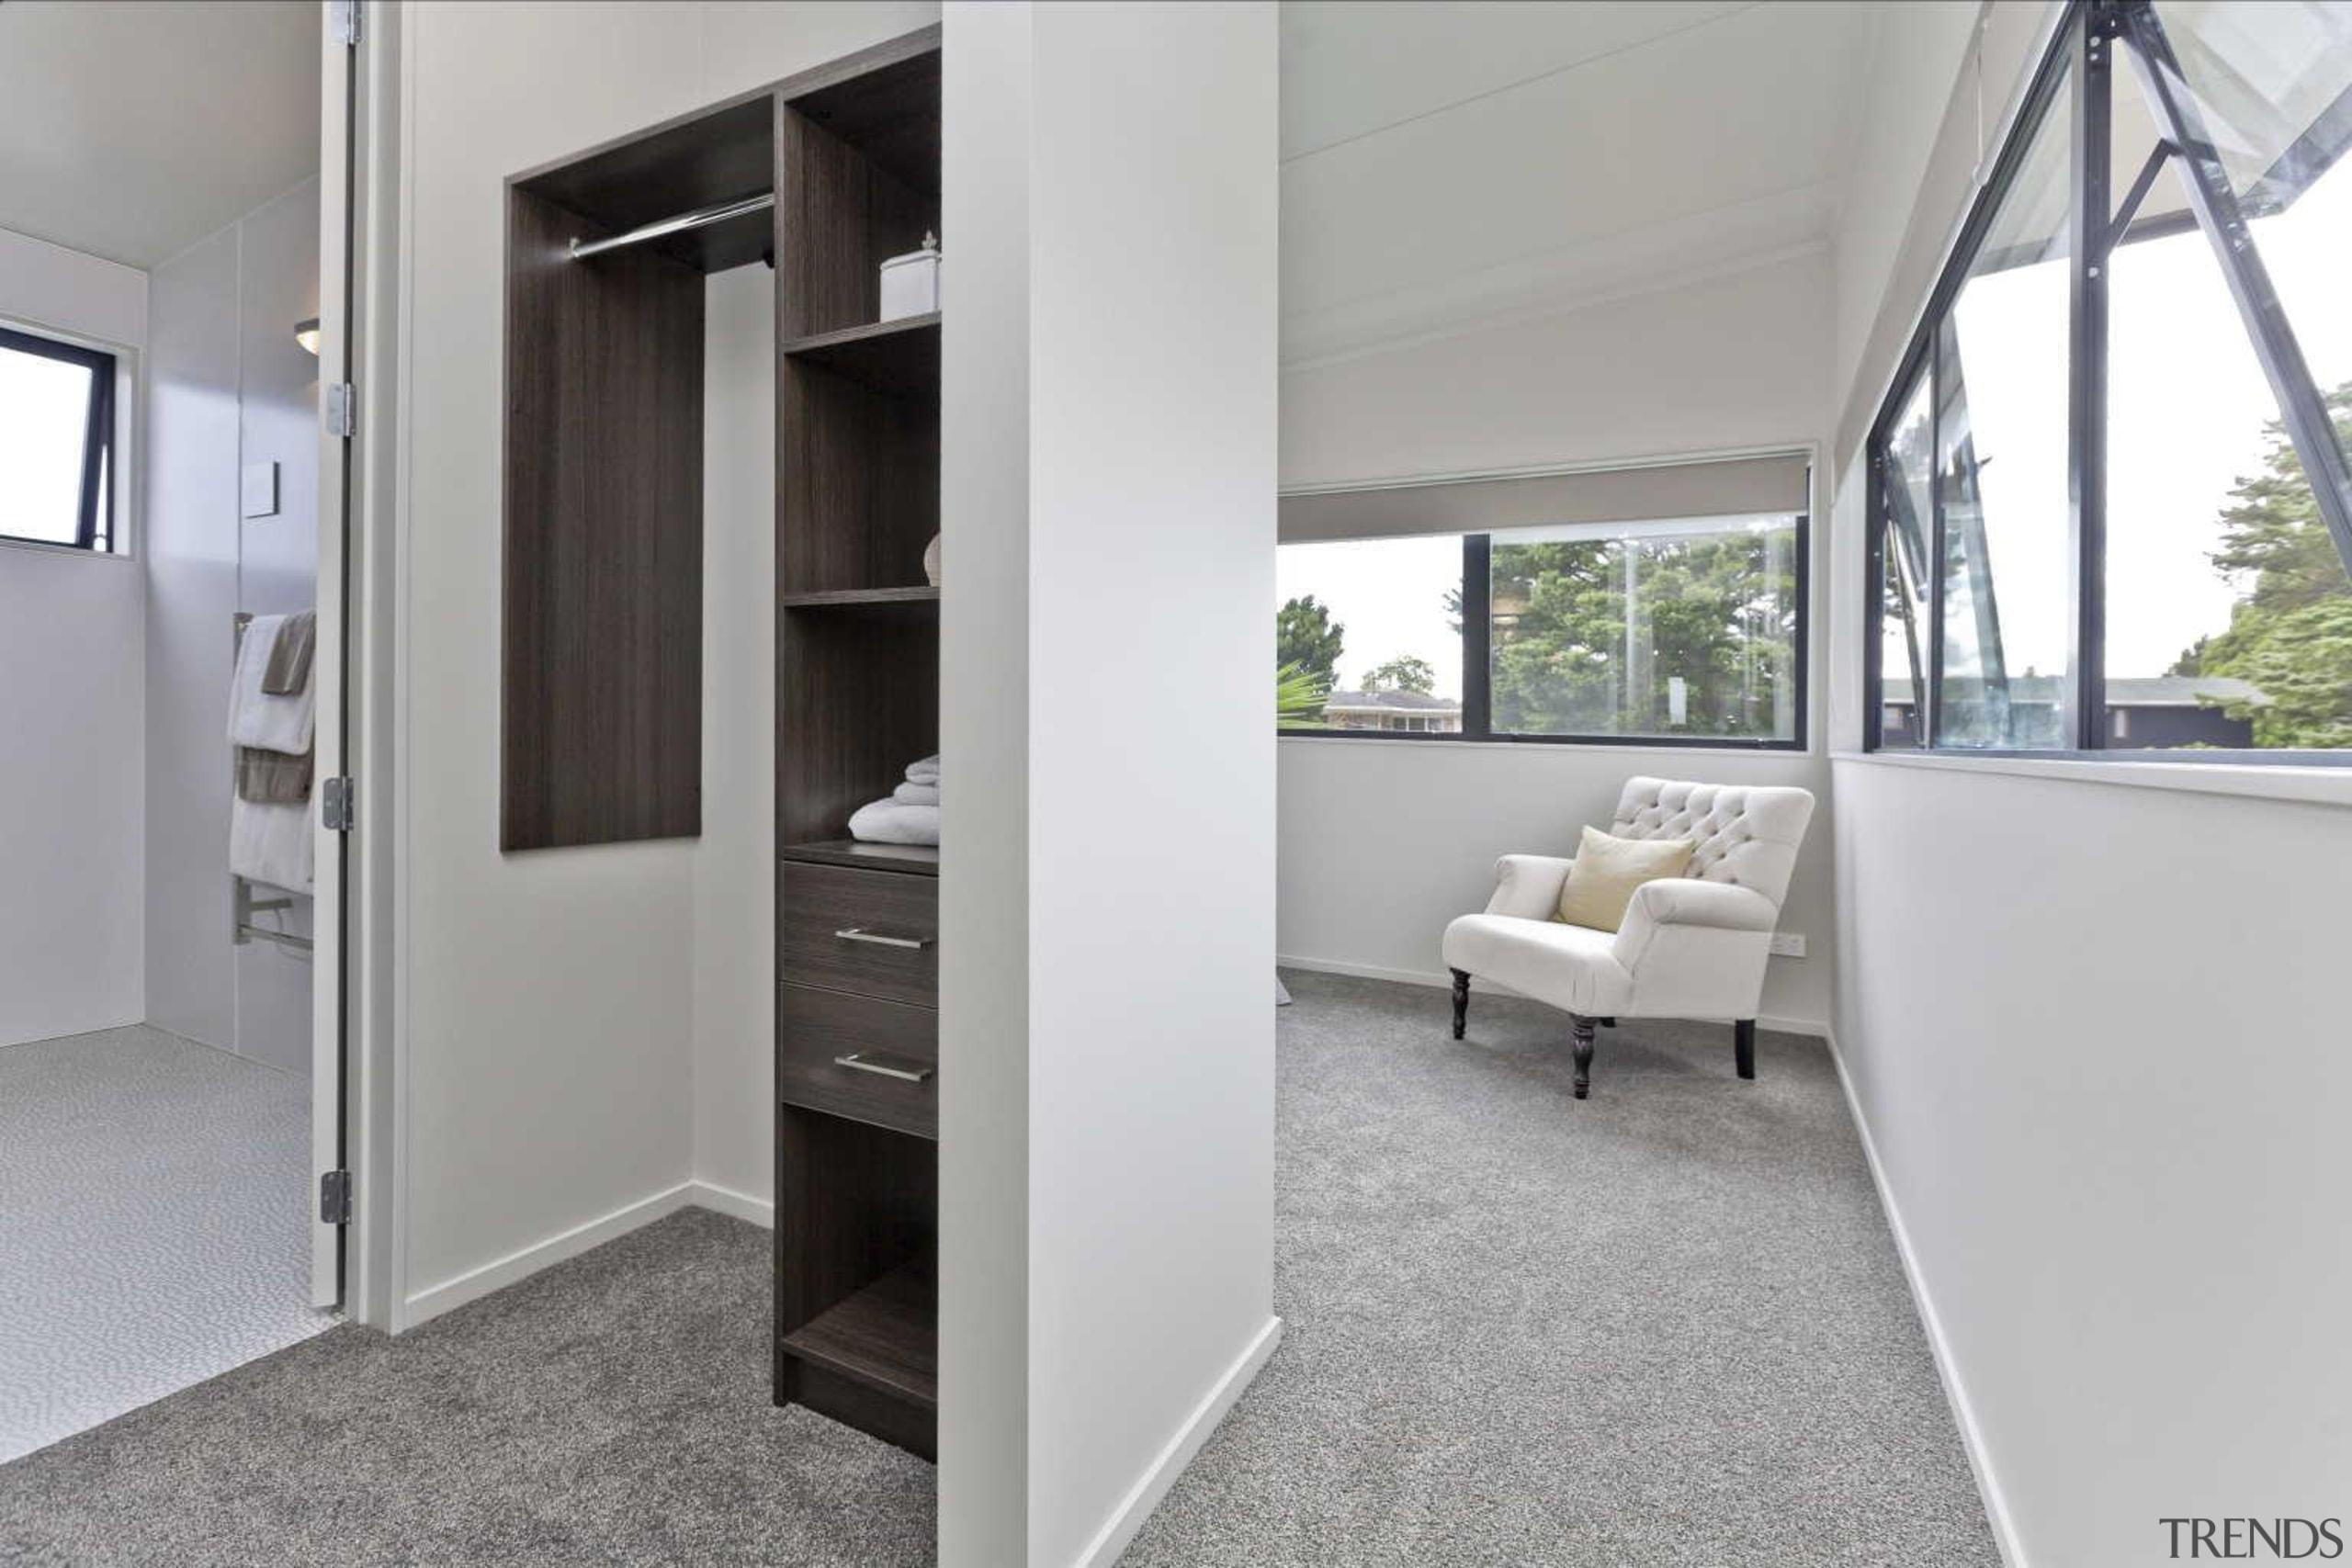 Let the light shines in - Interior Design architecture, interior design, property, real estate, gray